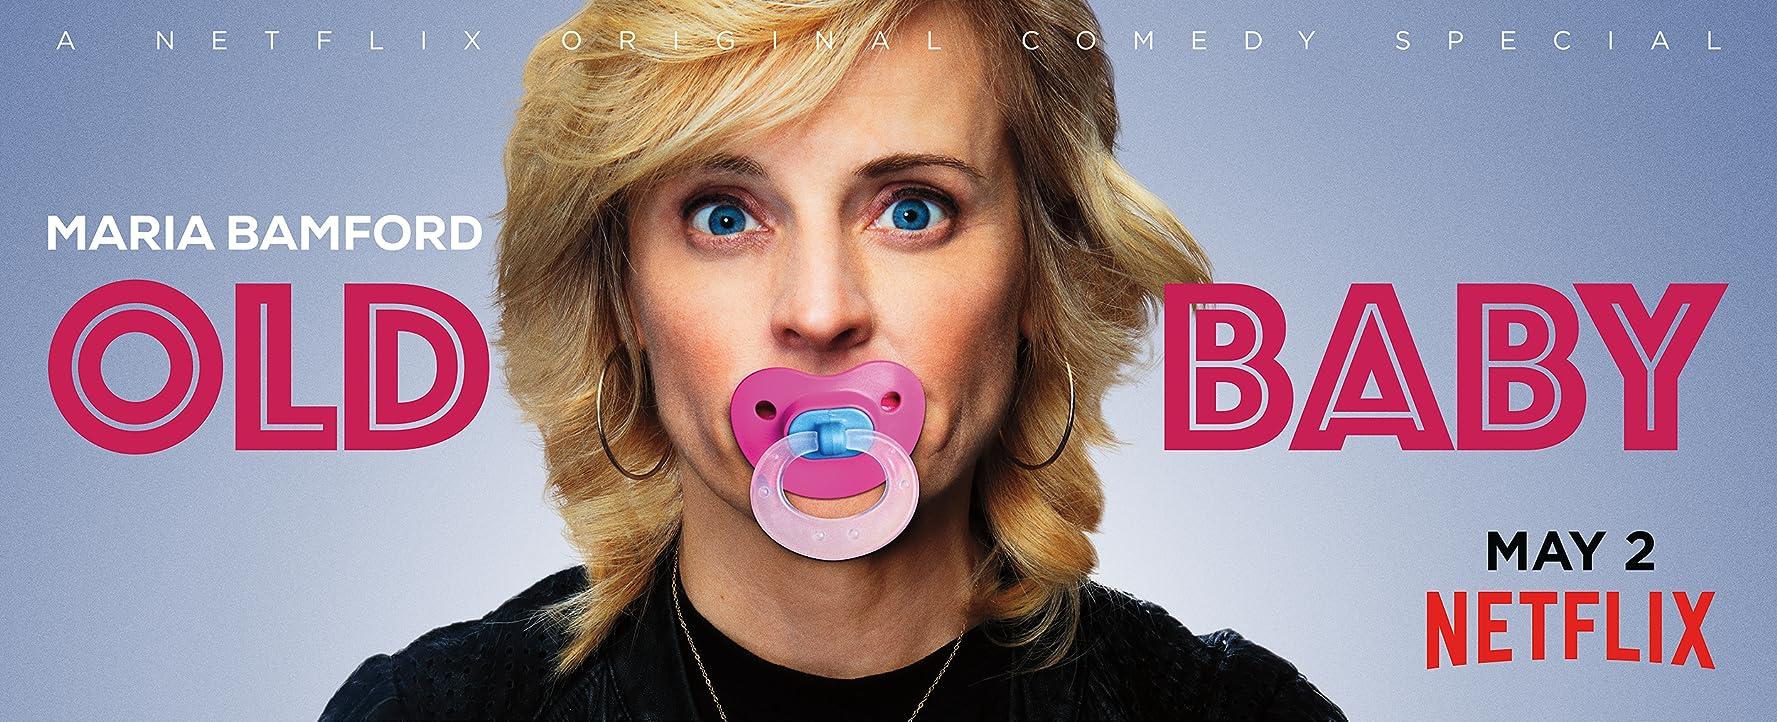 Old Baby (Netflix)